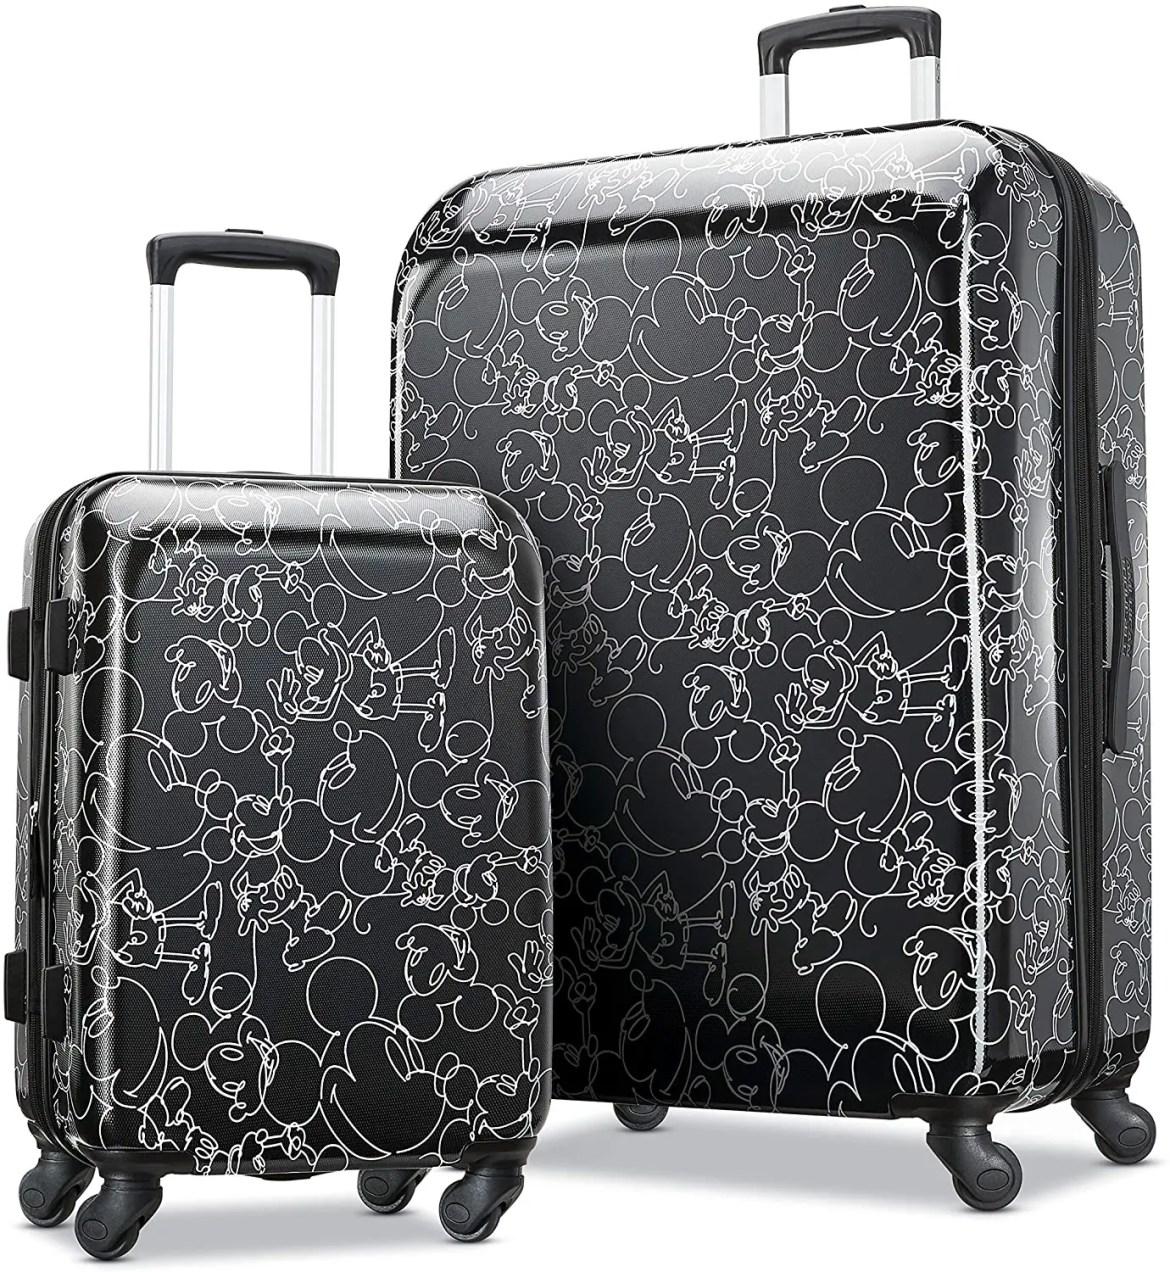 American Tourister Disney Luggage Sets